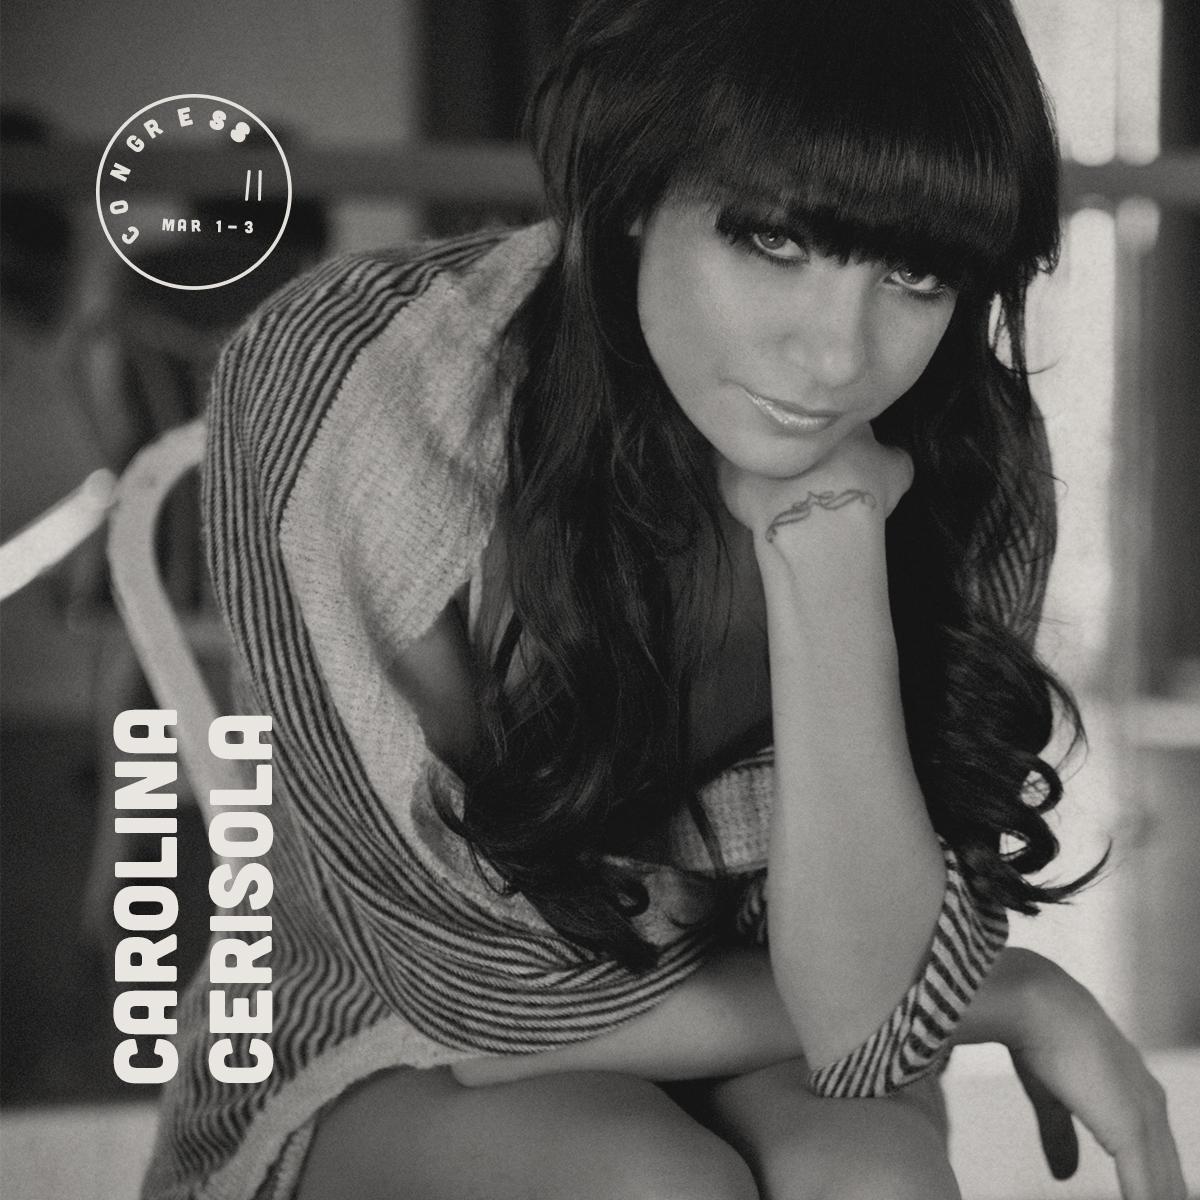 choreo-CarolinaCerisola.jpg